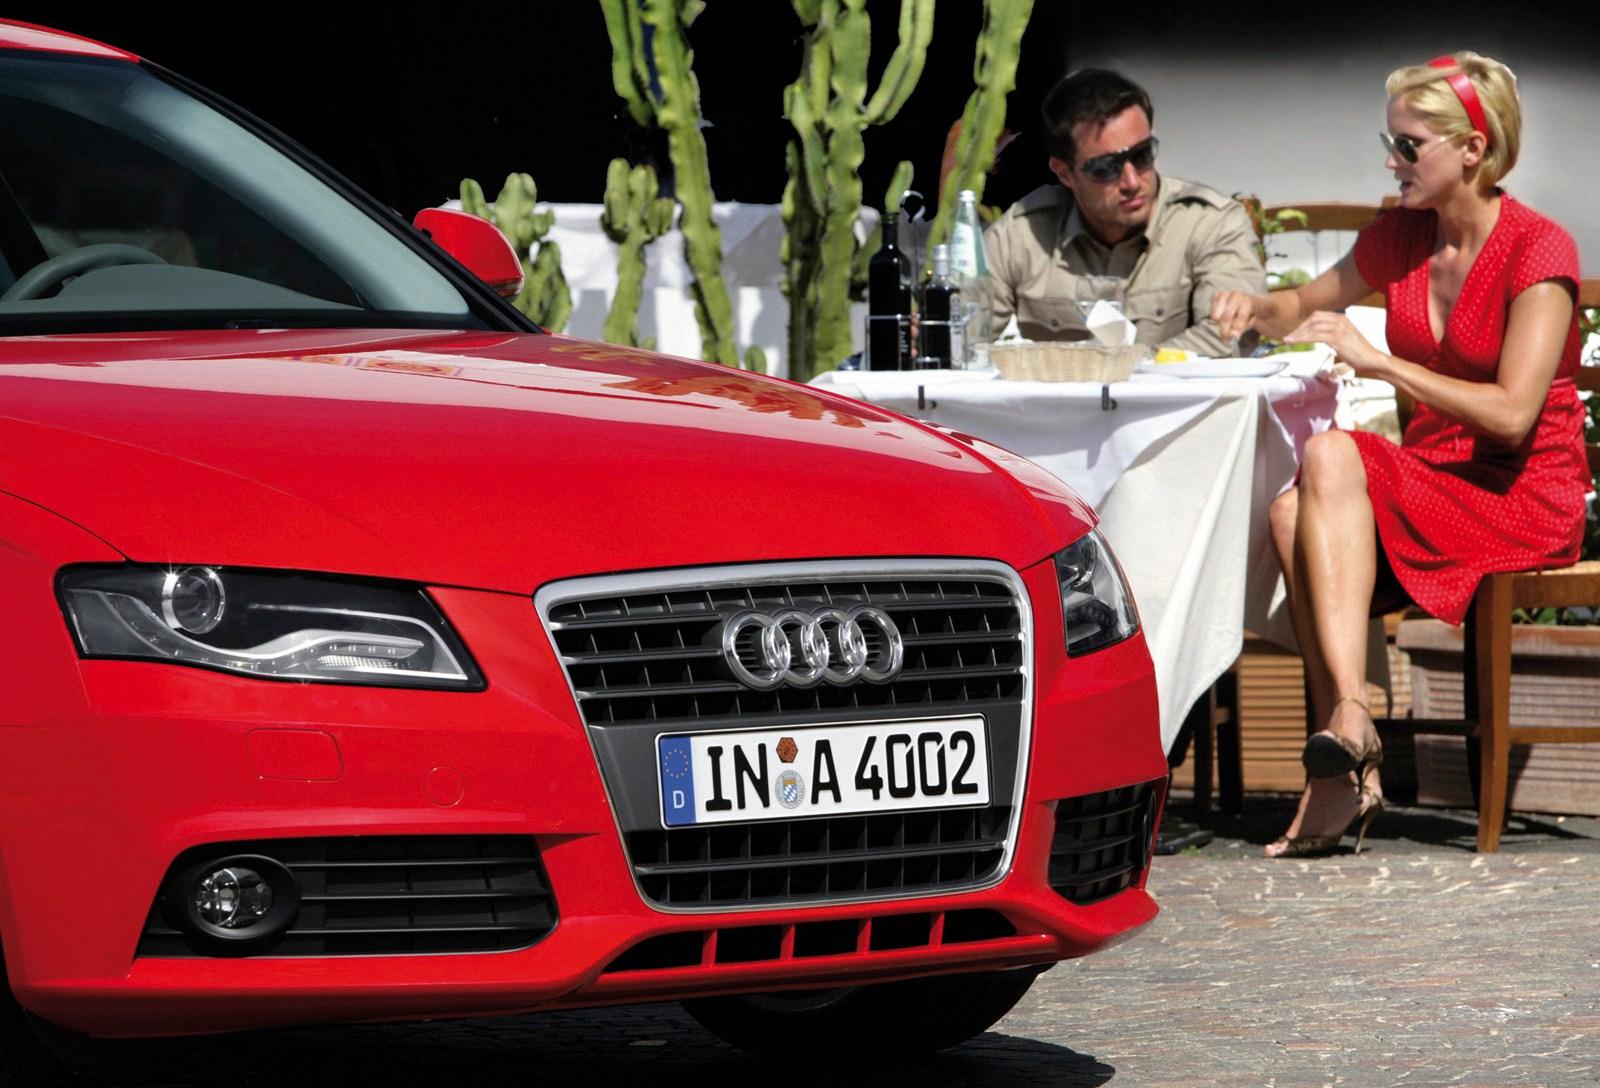 https://3.bp.blogspot.com/_sRGU_JXOz6E/TSiTVi-yj3I/AAAAAAAABE4/EcIgvsscgwY/s1600/Audi-A4_2008_wallpaper_4f.jpg